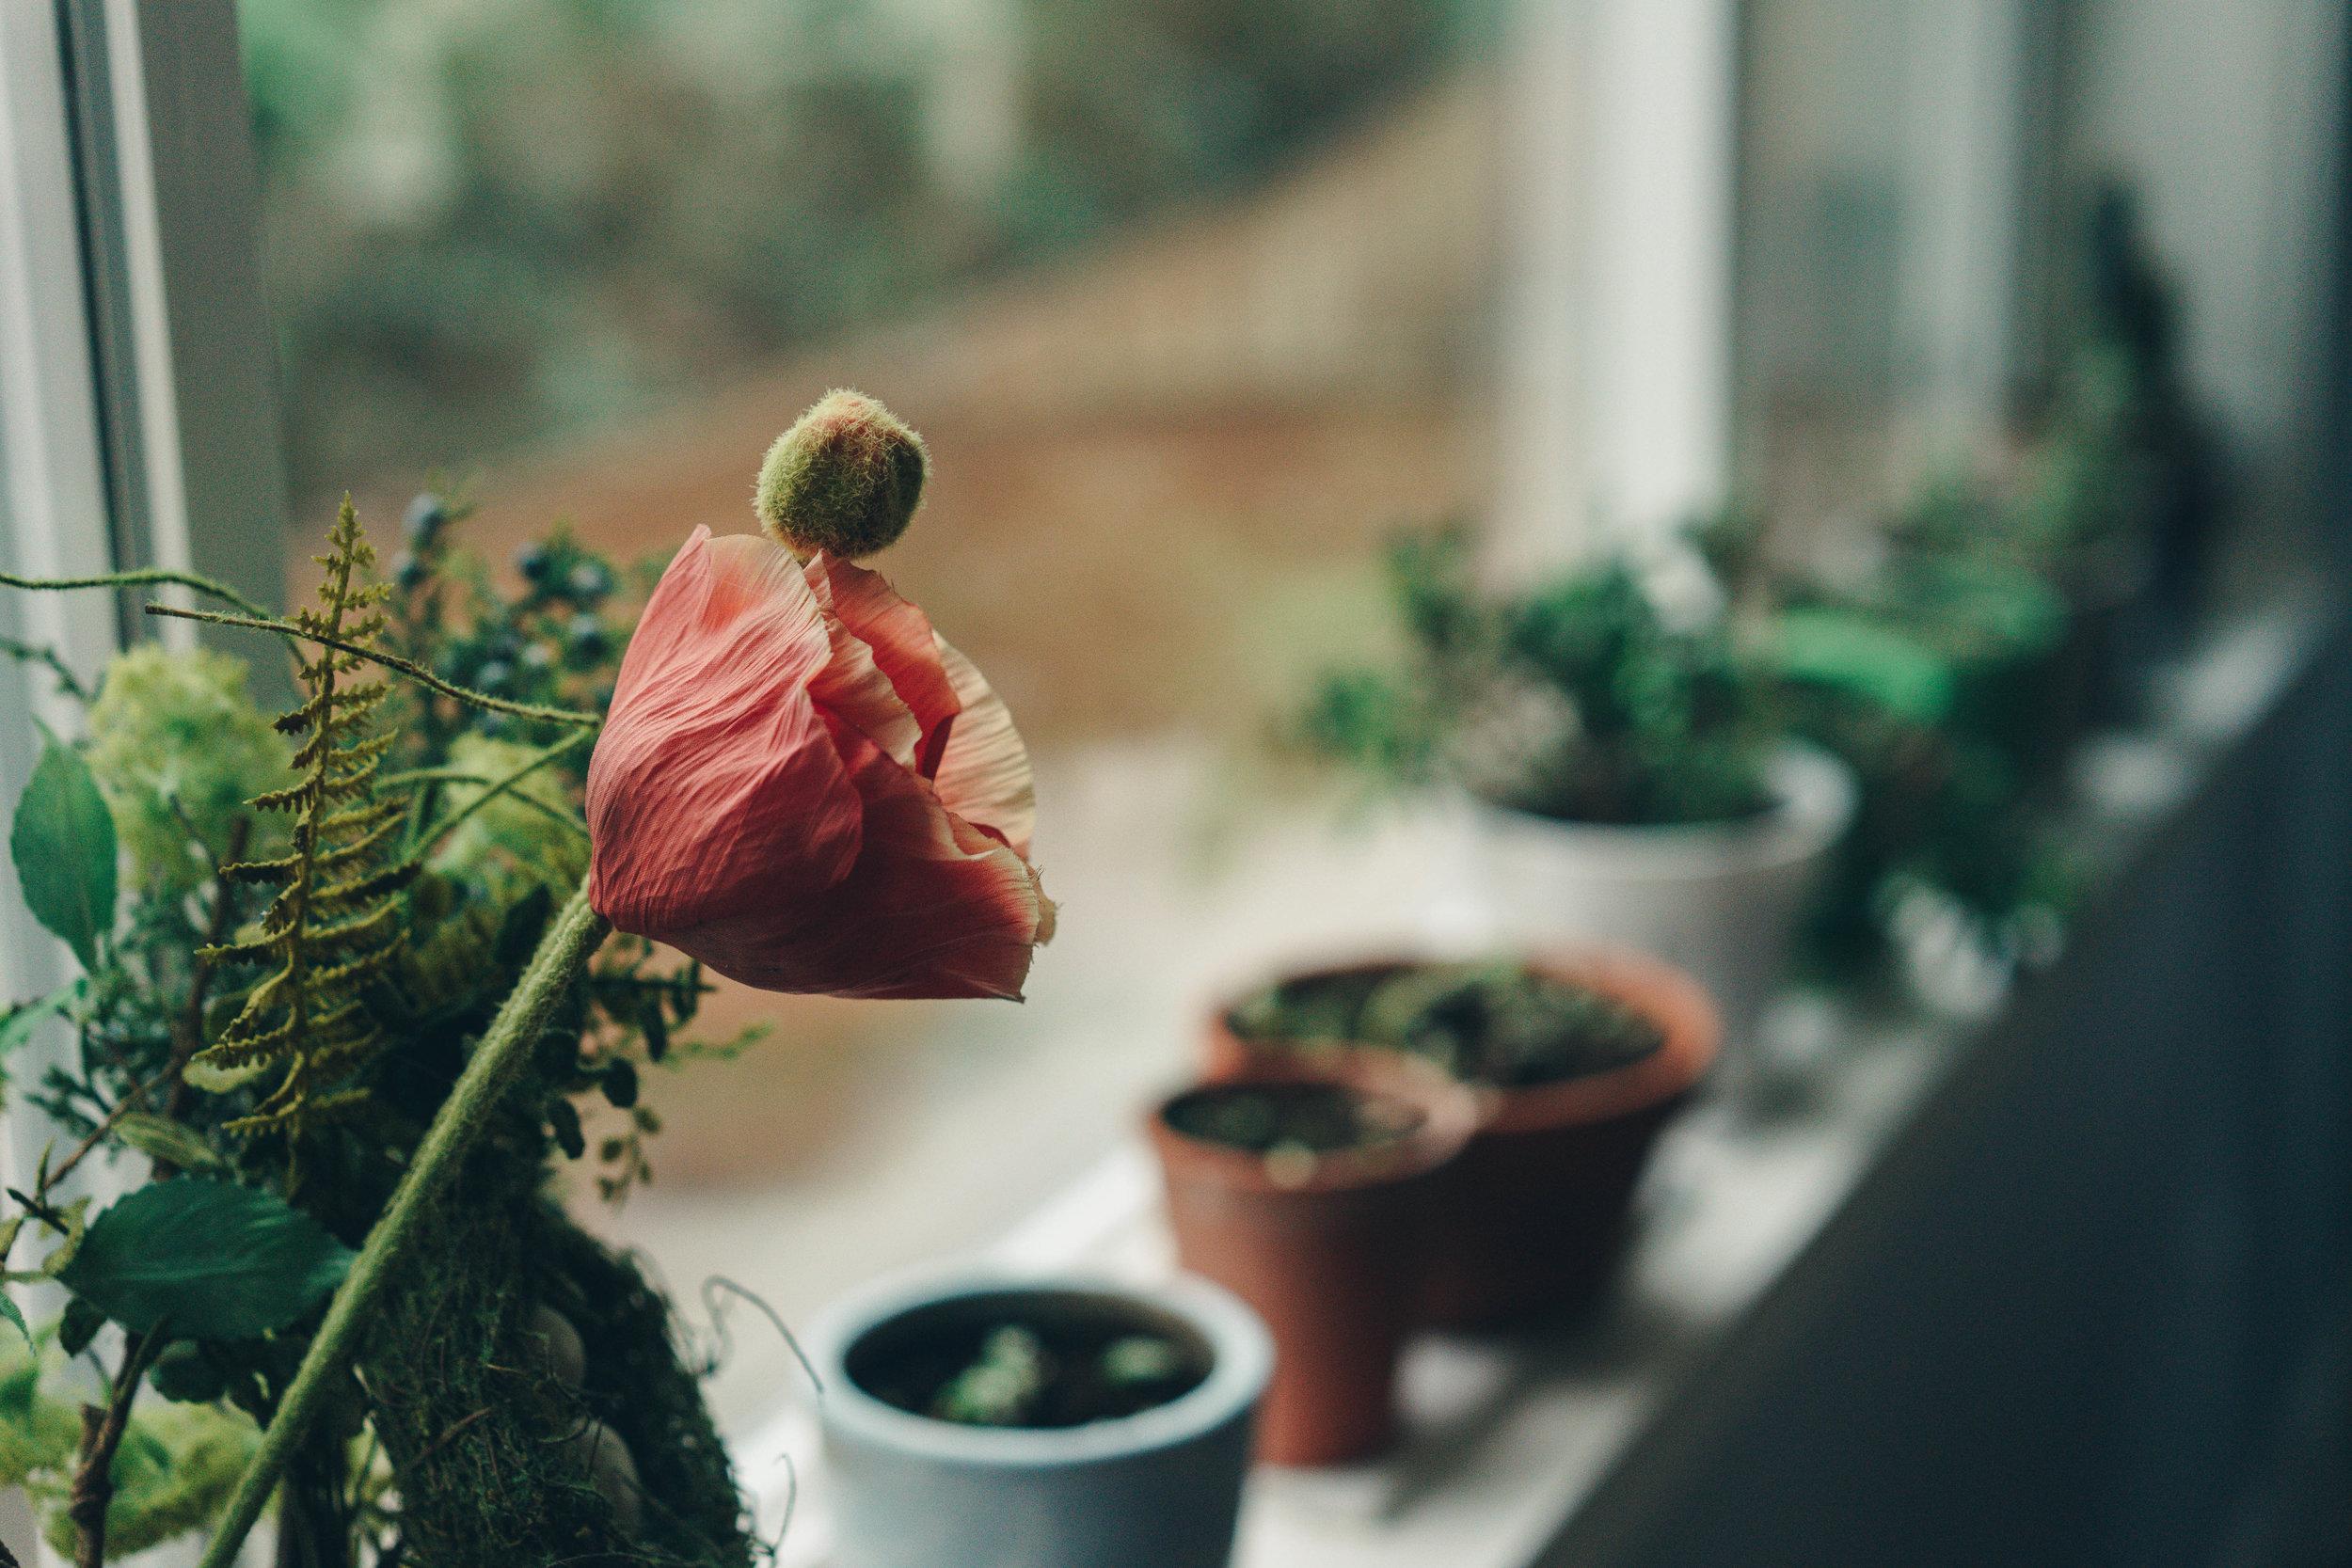 Her plants